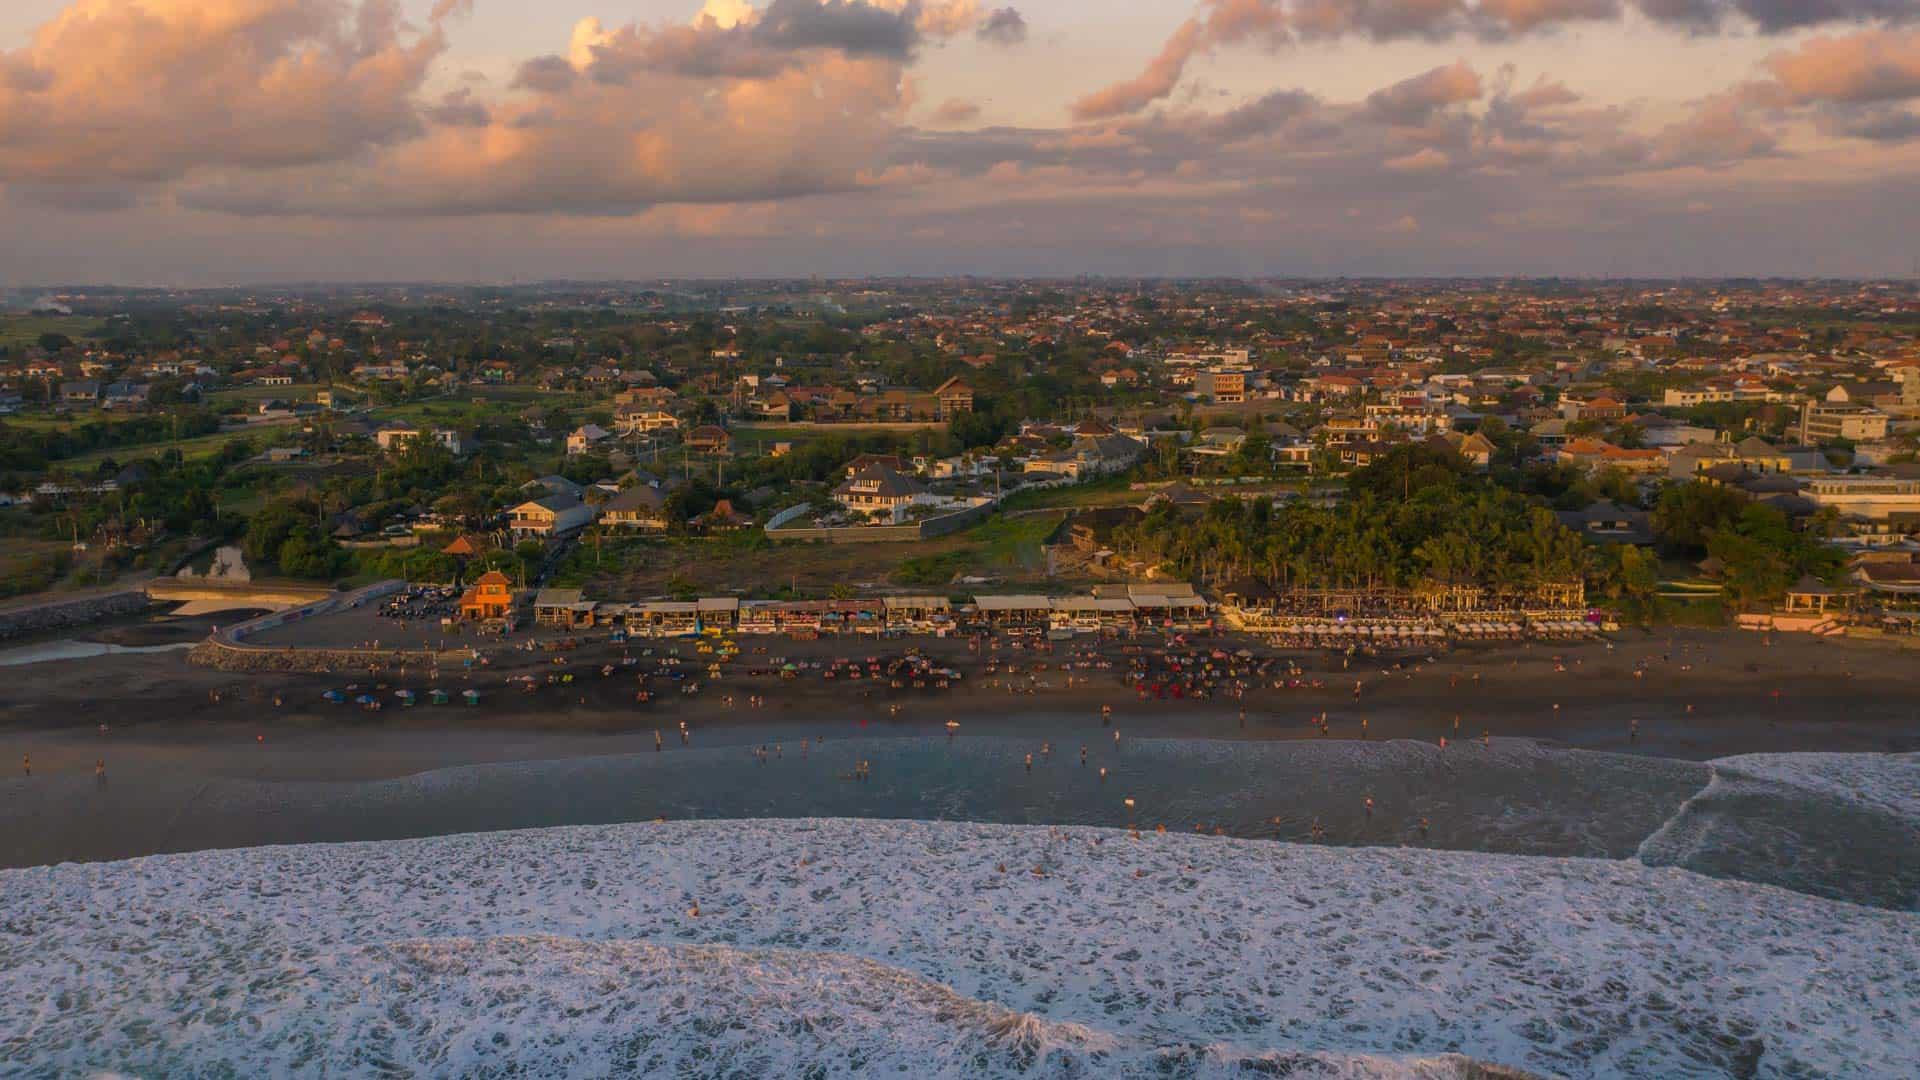 echo-beach-canggu-sunset